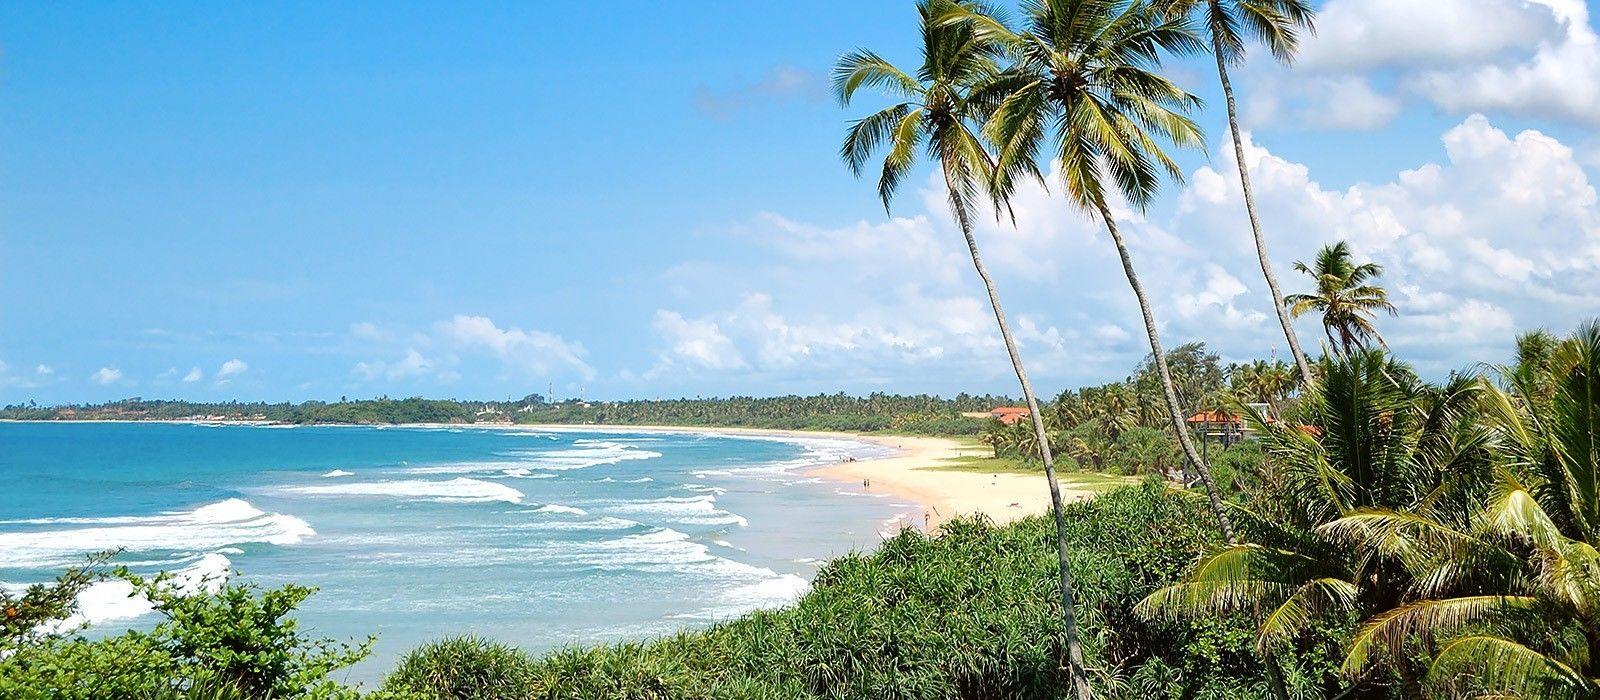 Luxuriös und hautnah – Große Sri Lanka Rundreise Urlaub 5